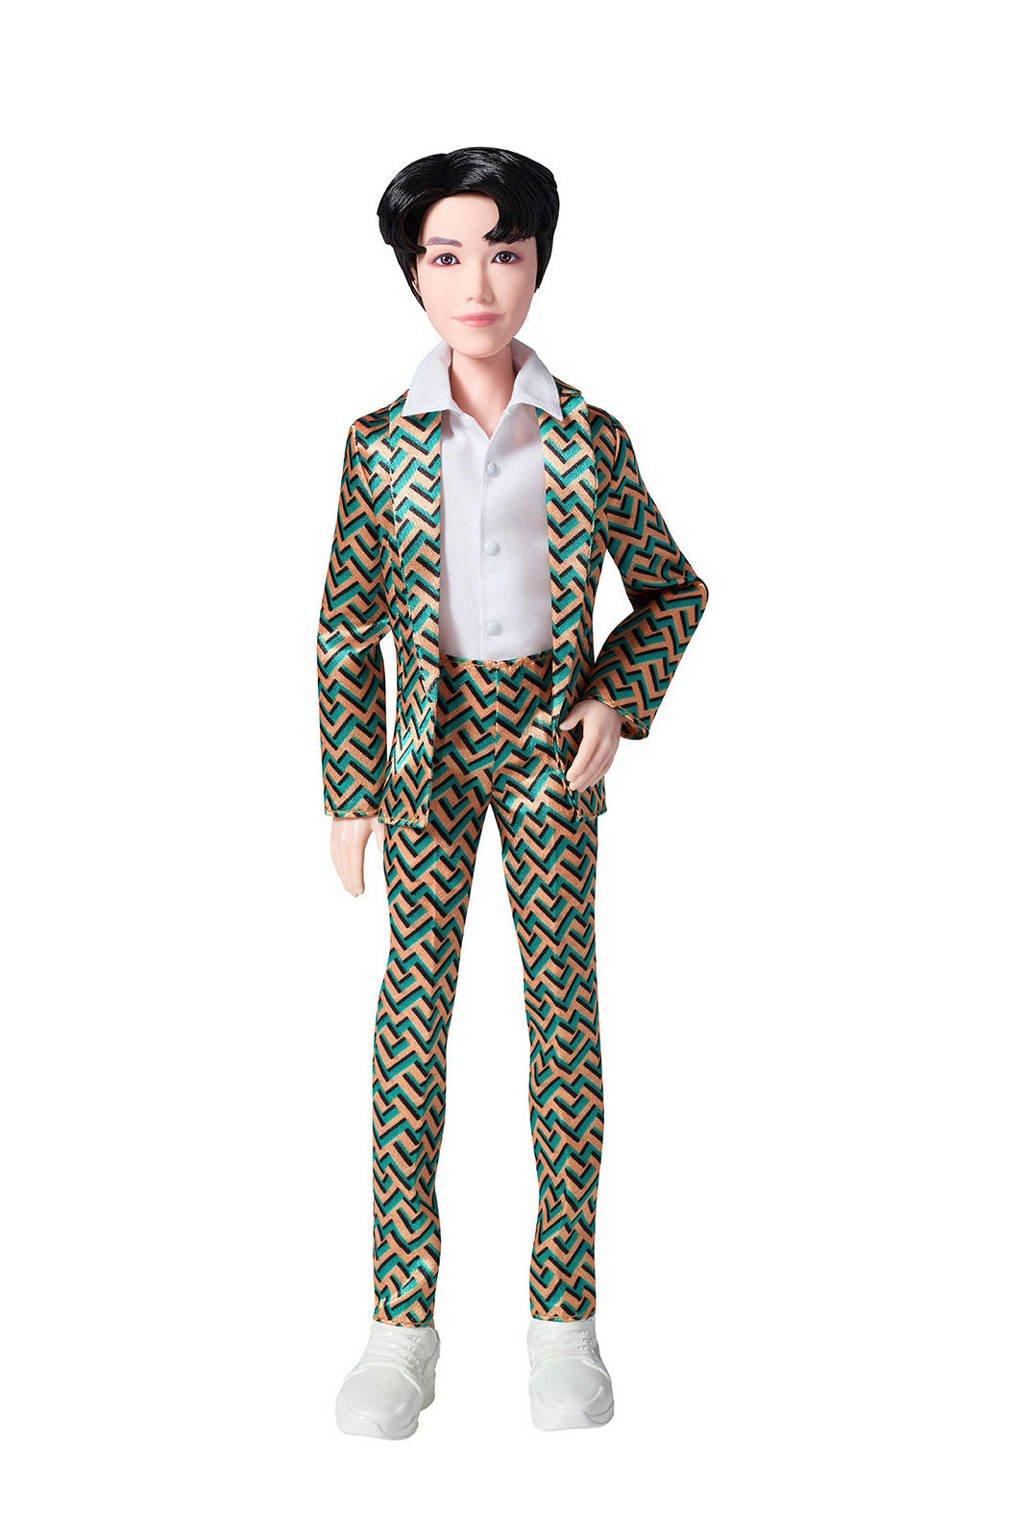 Mattel BTS Core J-Hope modepop